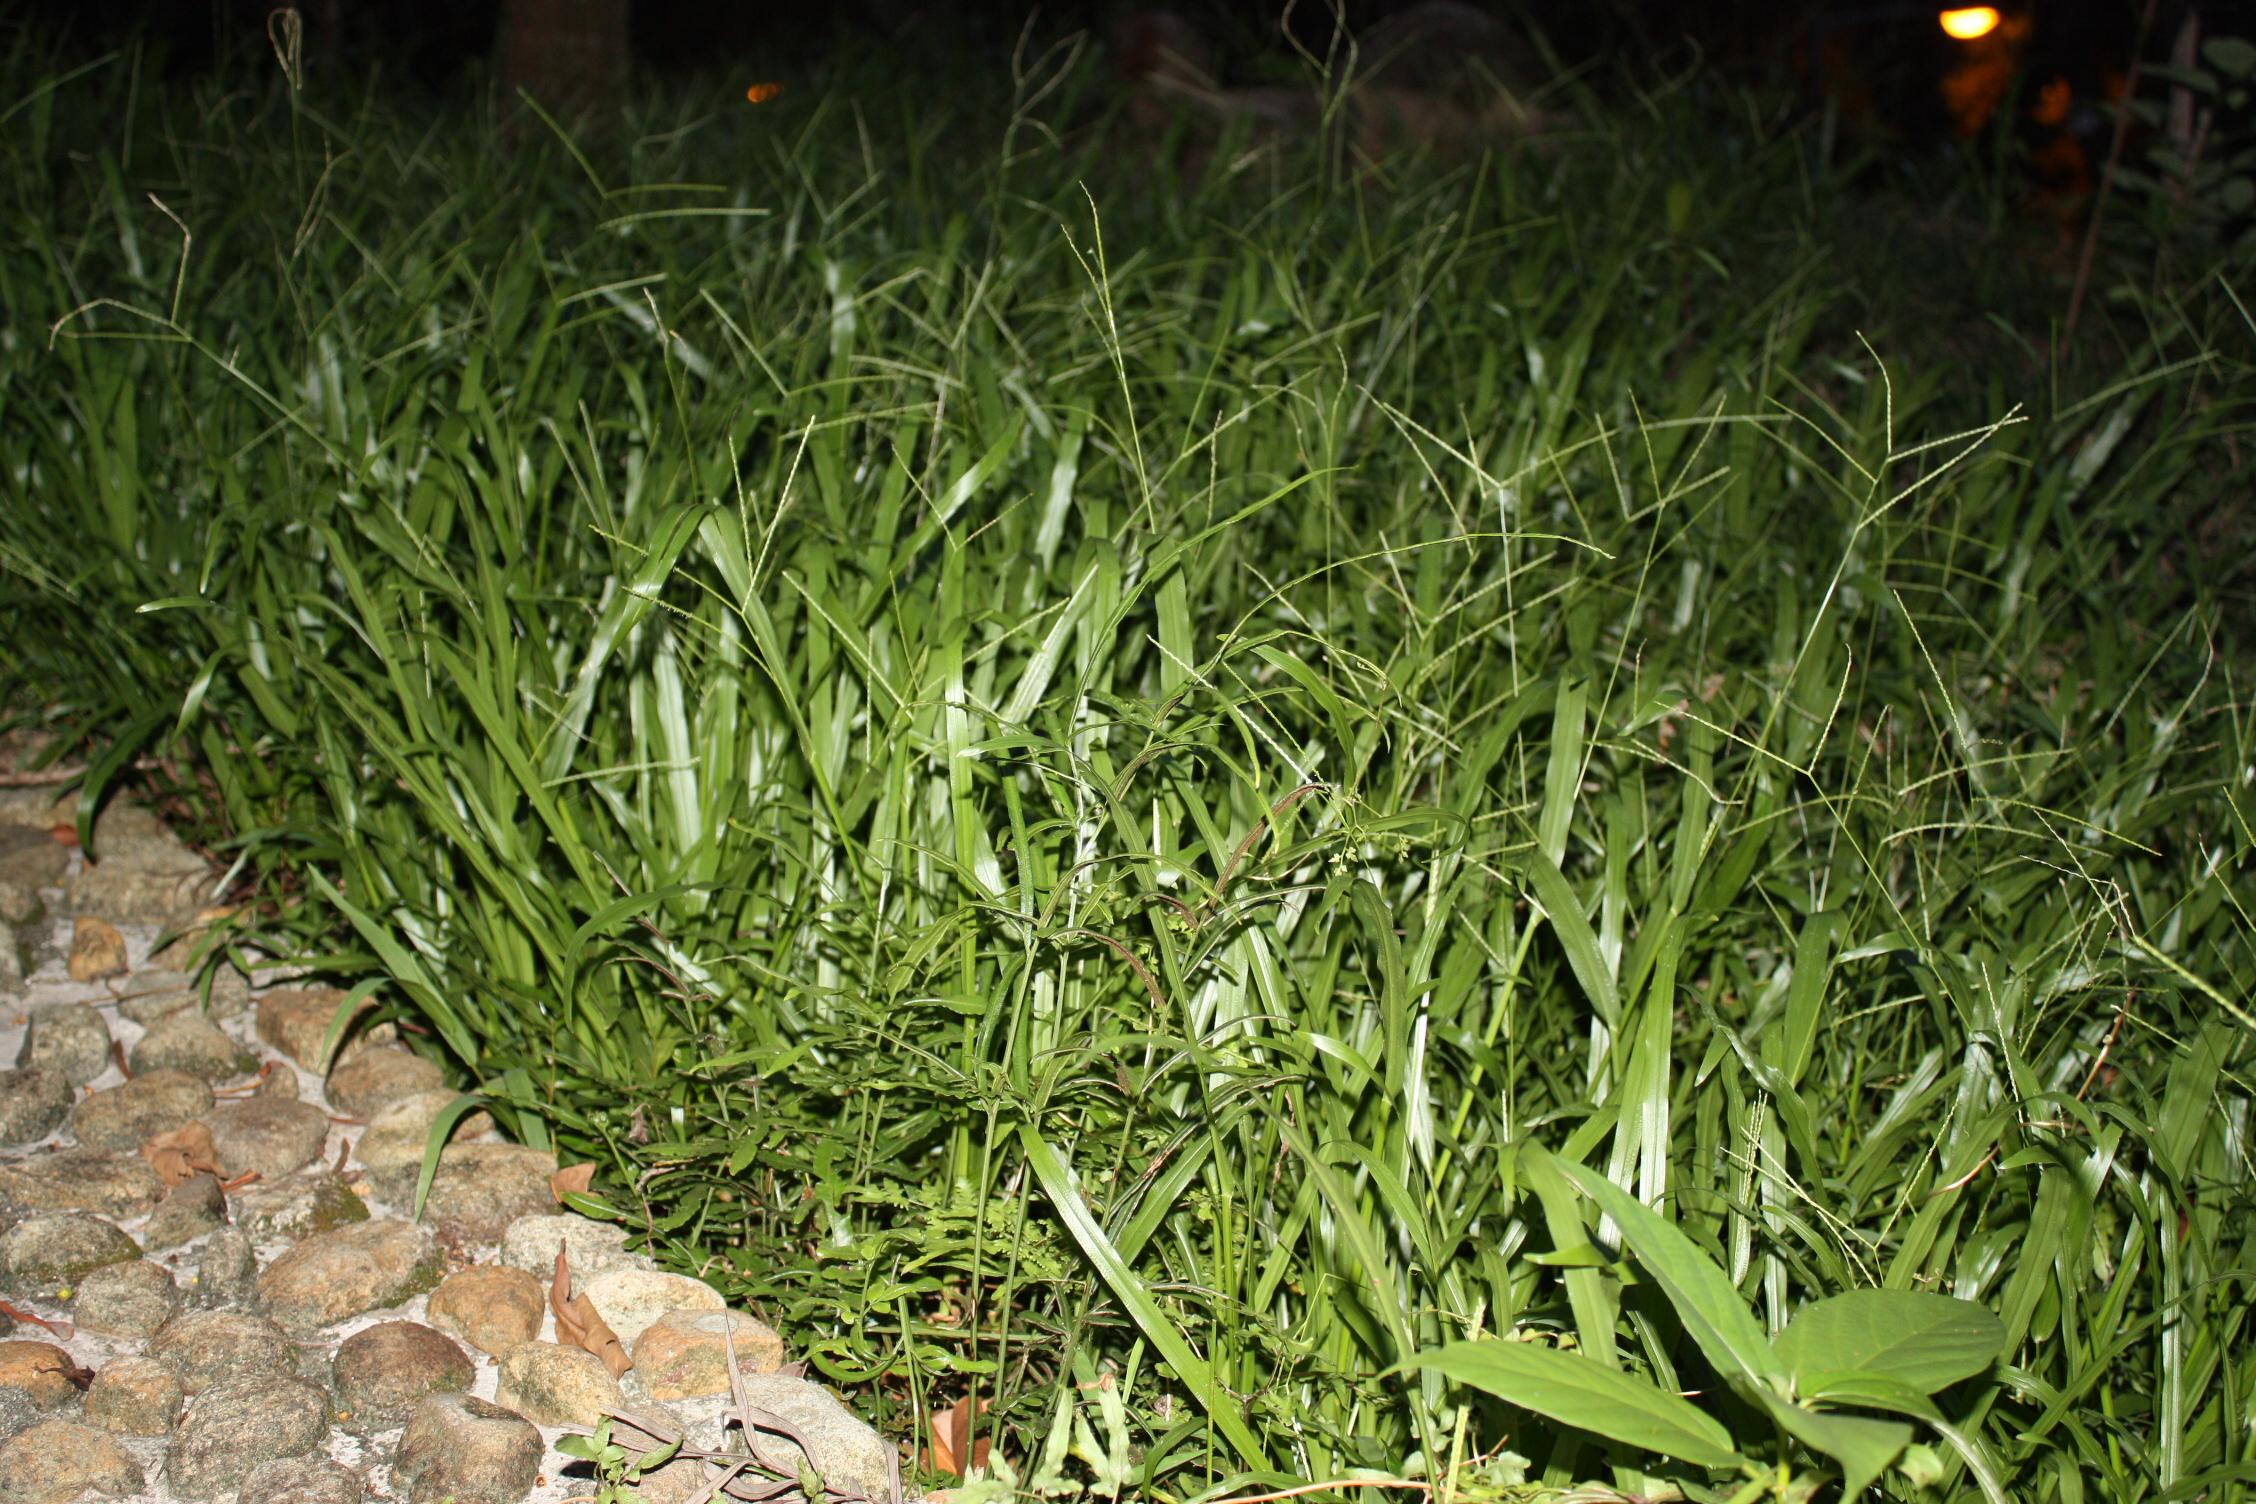 alas the fresh grass